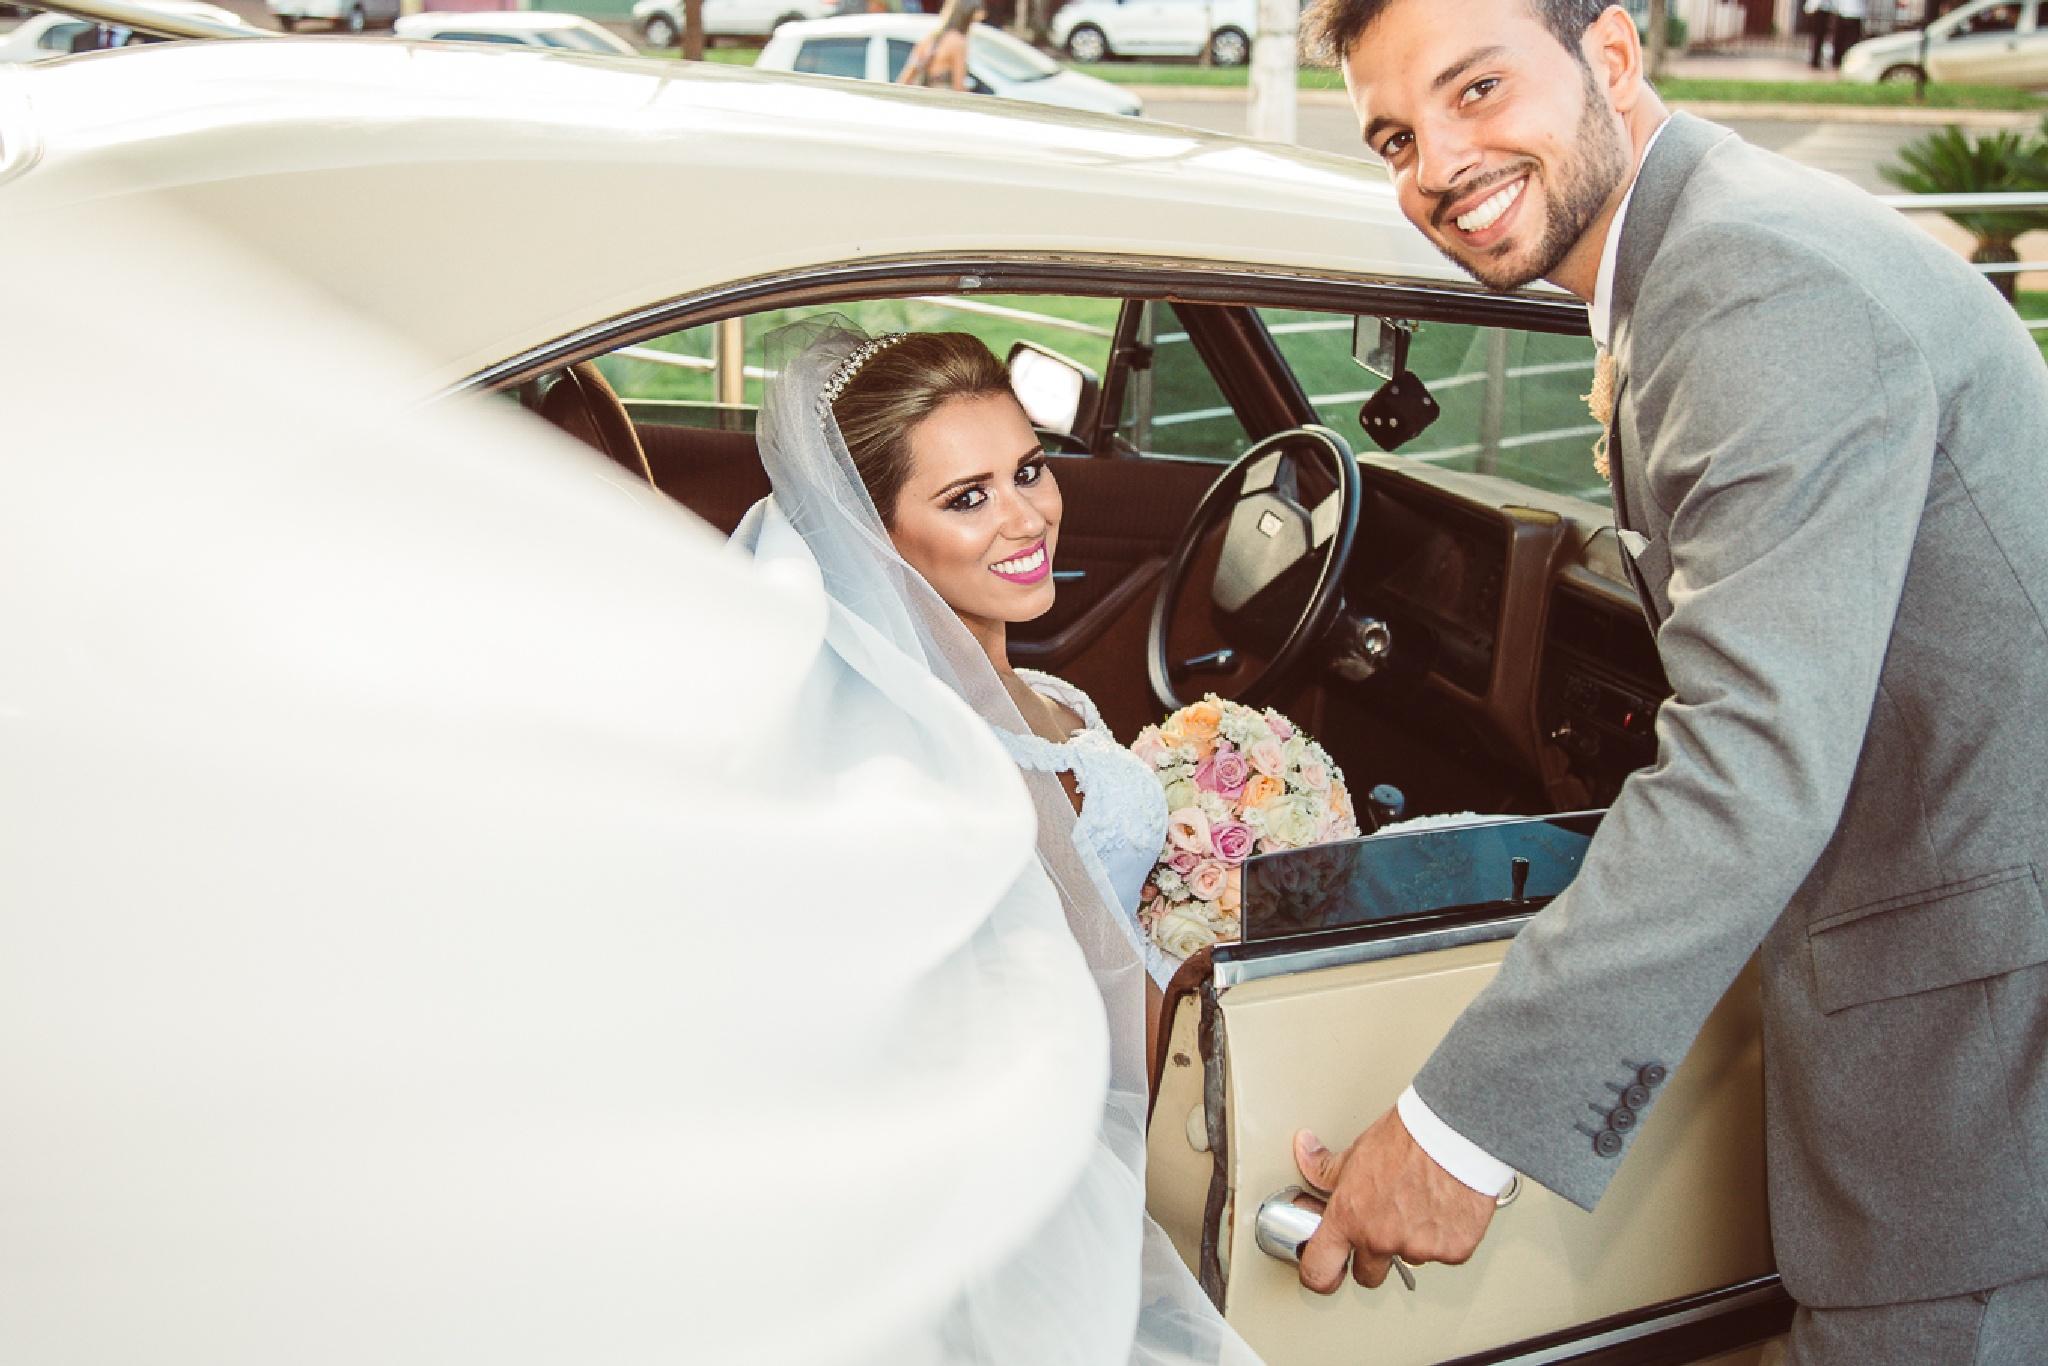 Wedding Angela e Bianch by photographyfc1